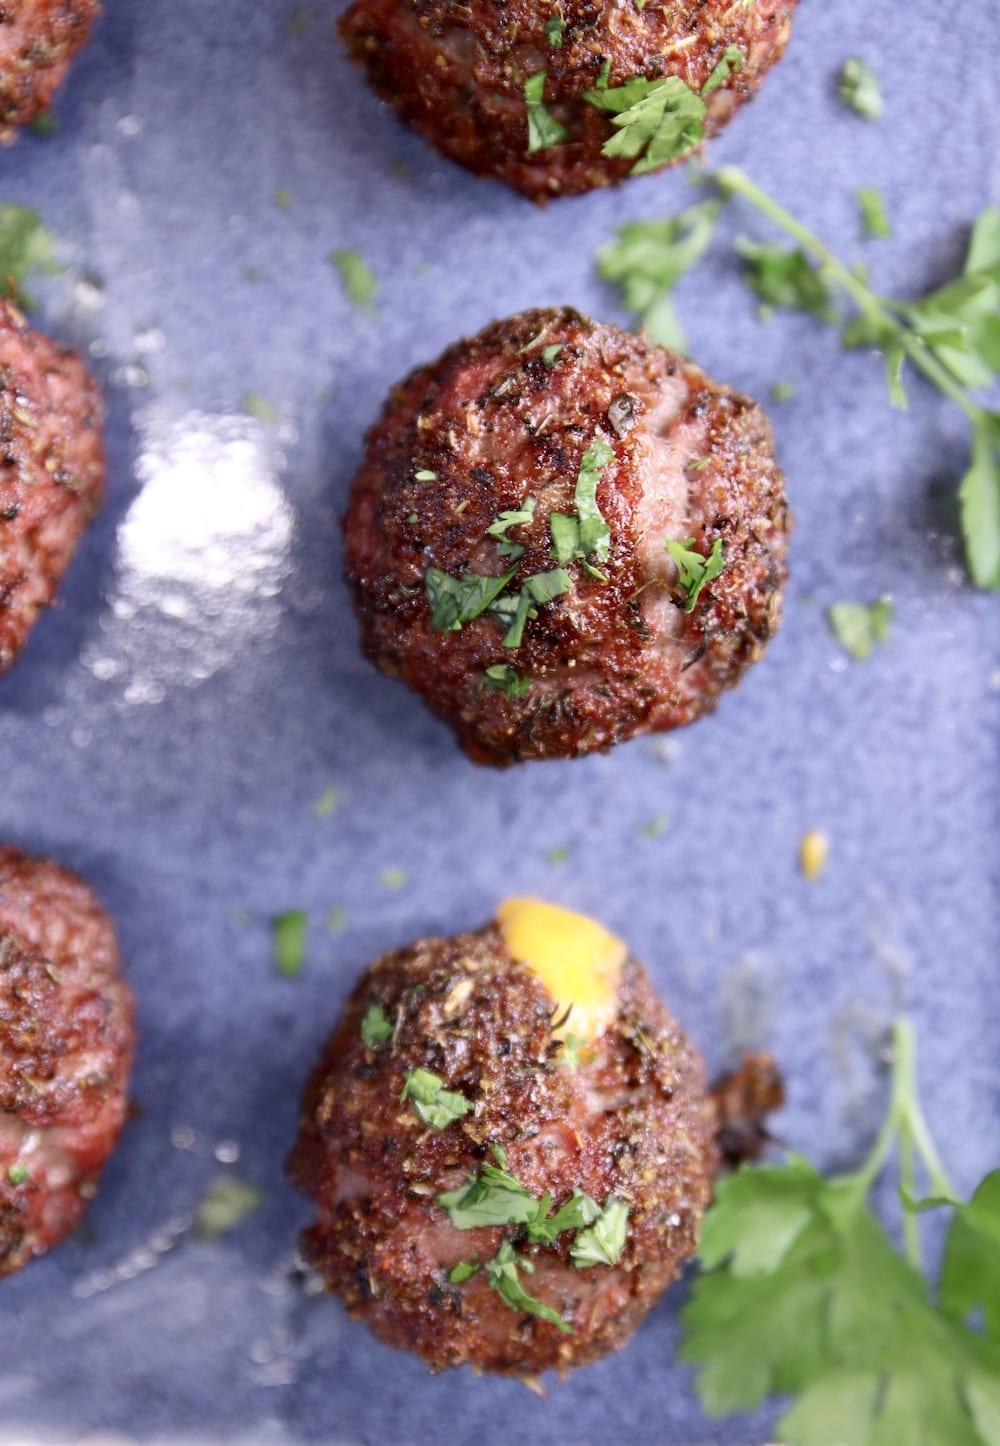 Grilled Meatballs on a blue platter